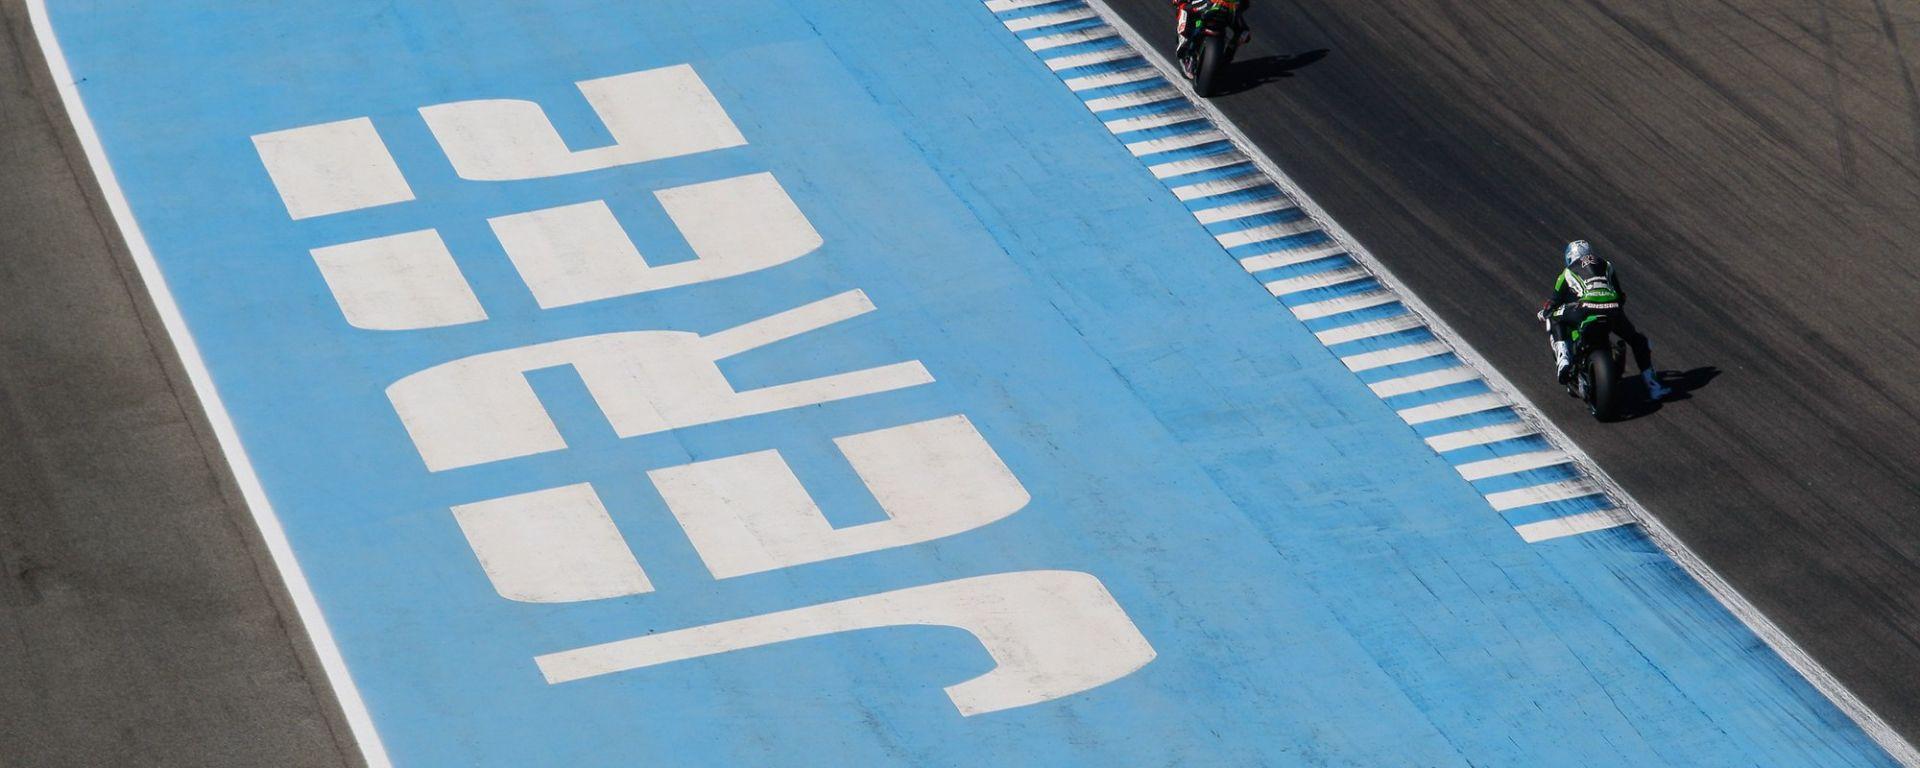 Gran Premio di Jerez Spagna Superbike: risultati Gara 1 e Gara 2